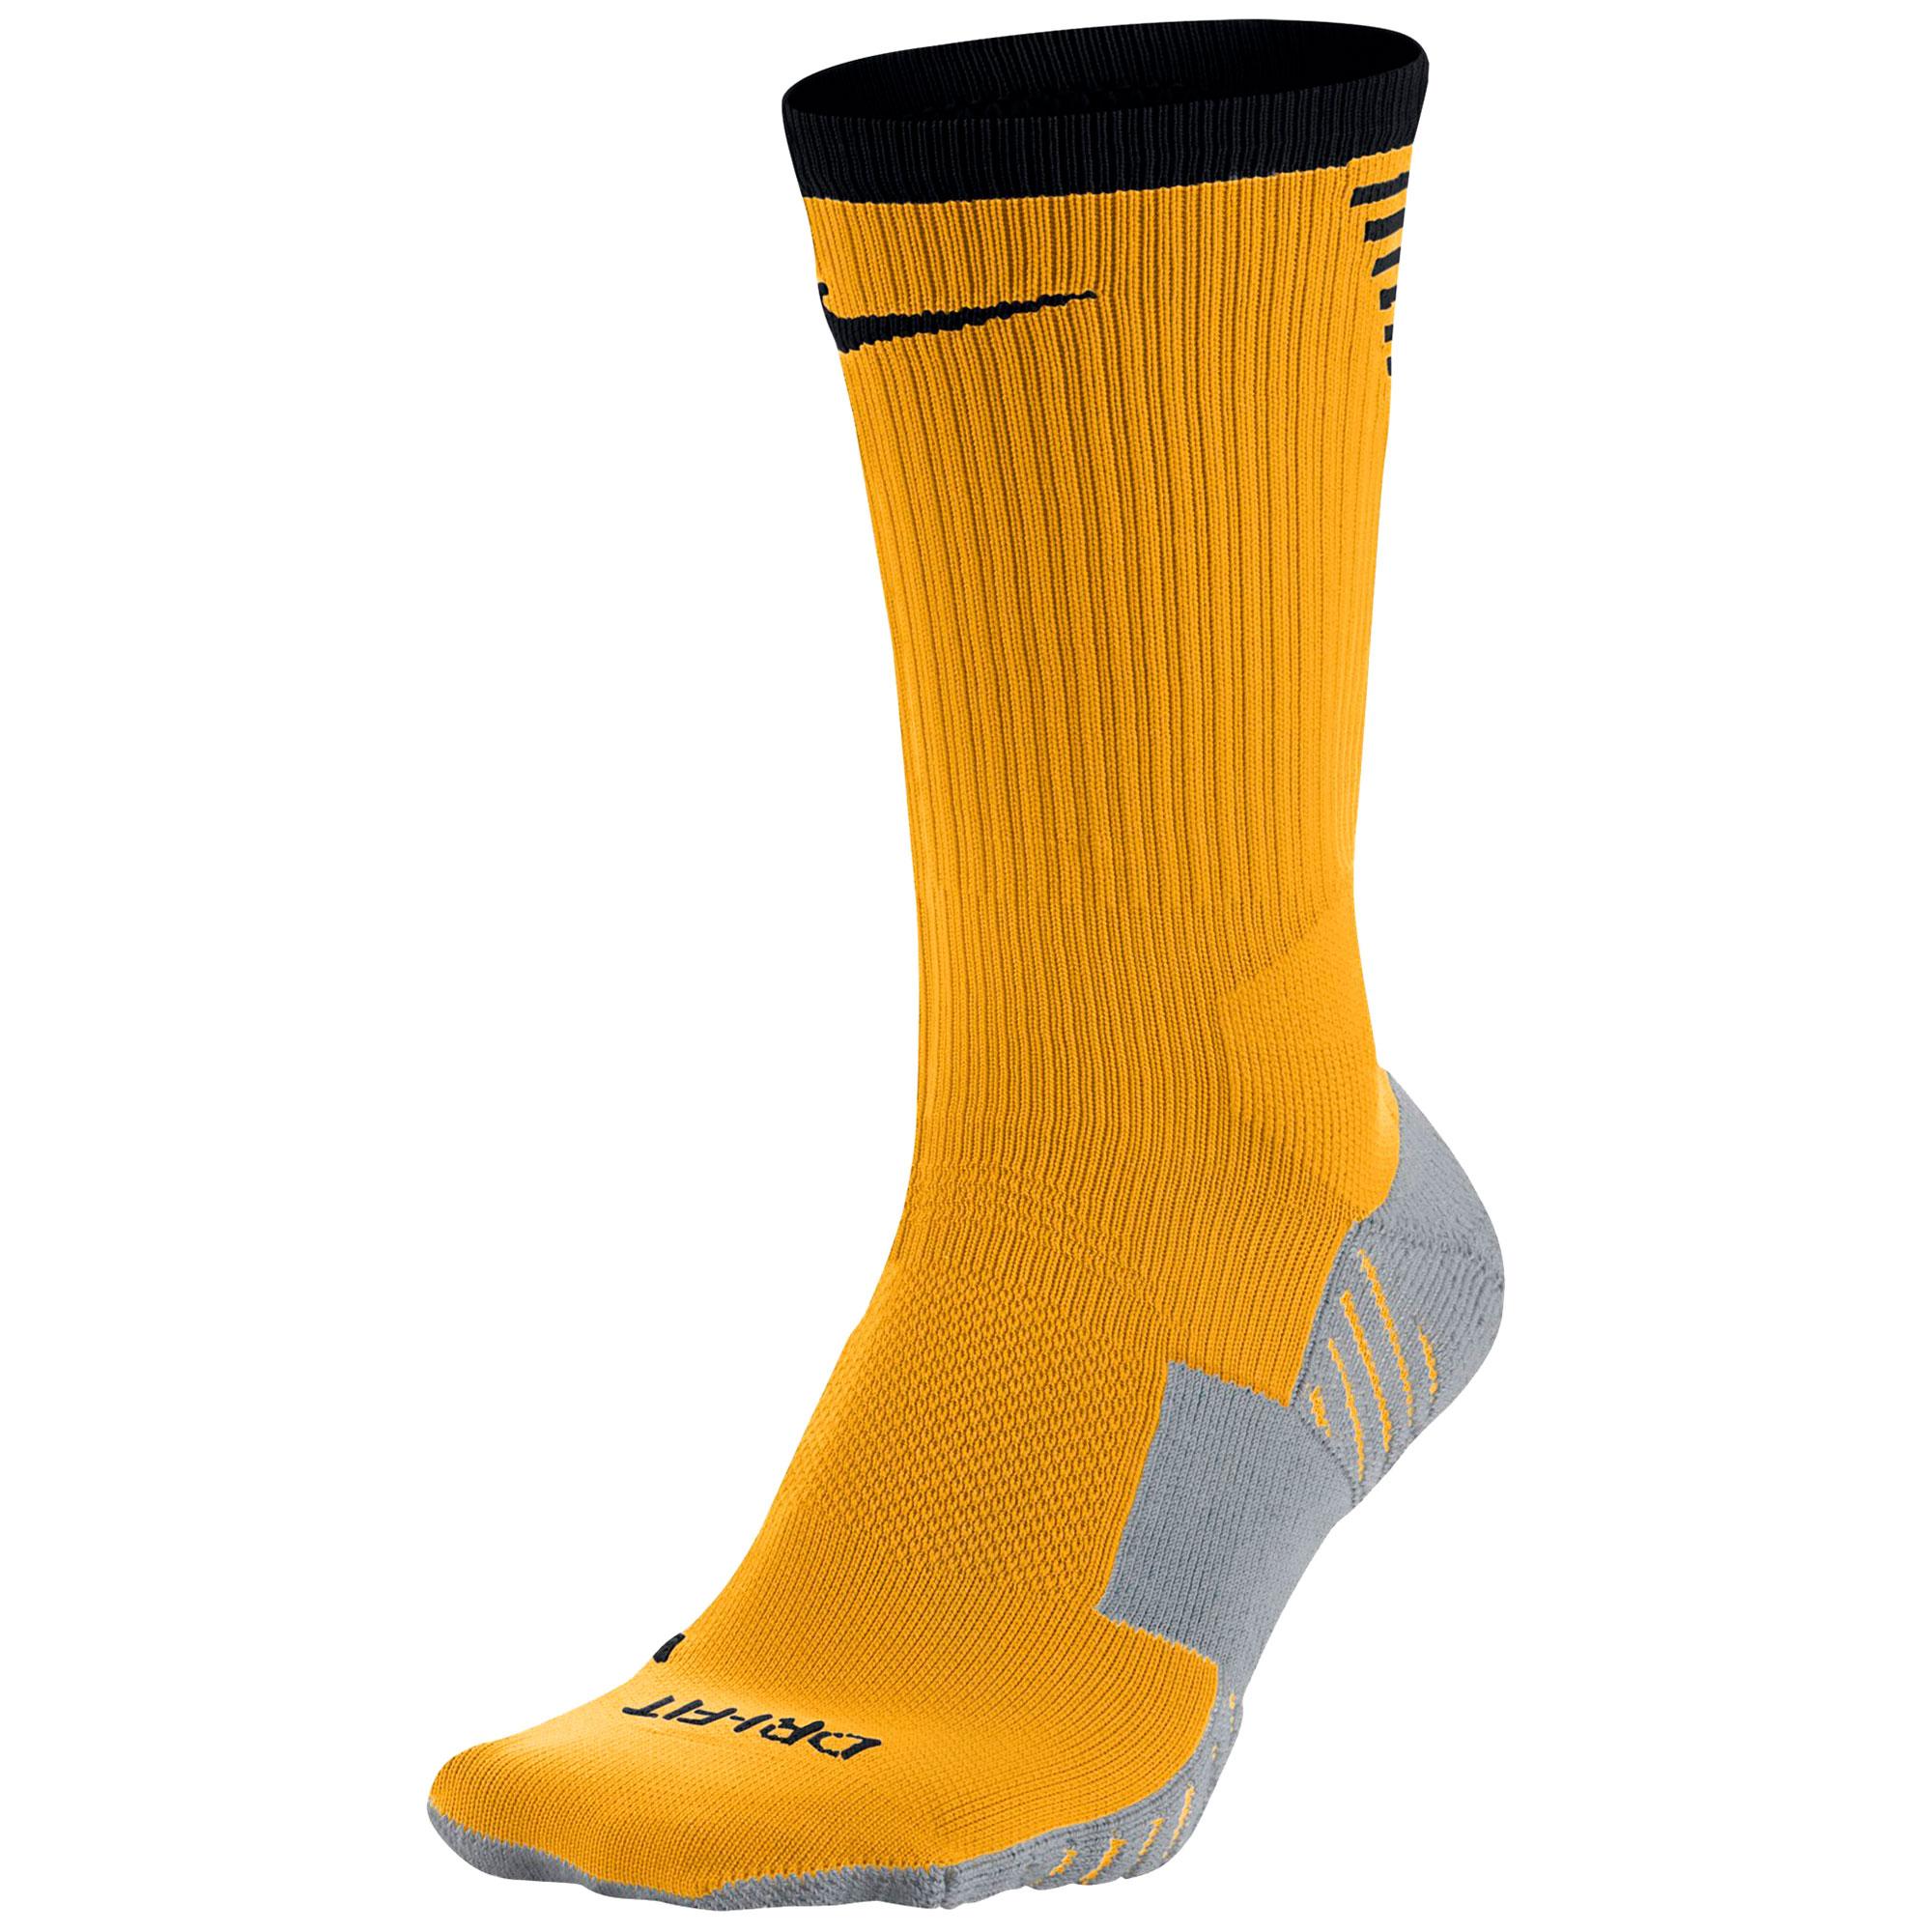 Nike Dry Squad Crew Football Sock - Laser Orange/Black